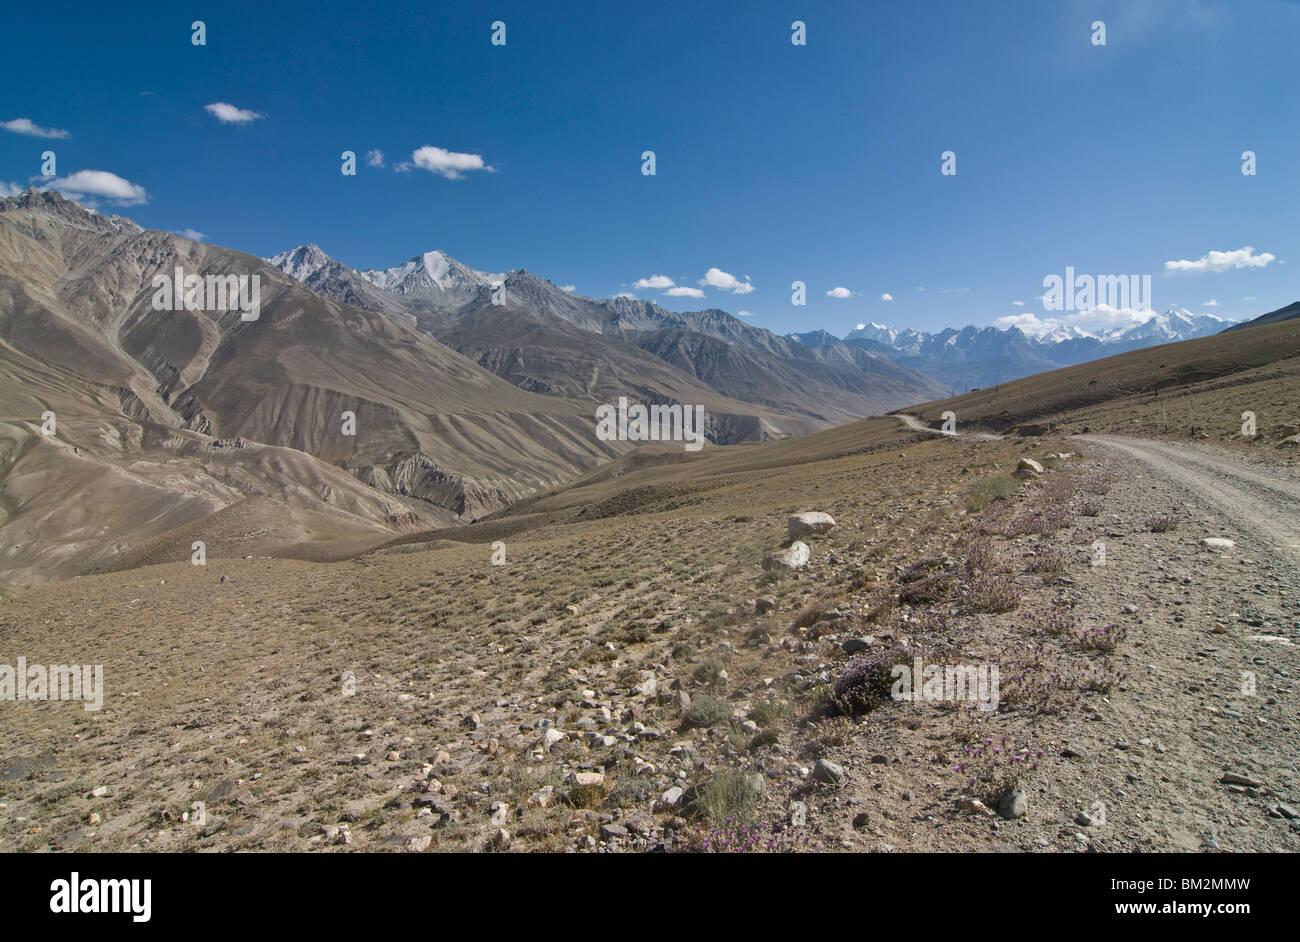 Mountain landscape of the Hindu Kush, Wakhan corridor, Afghanistan - Stock Image